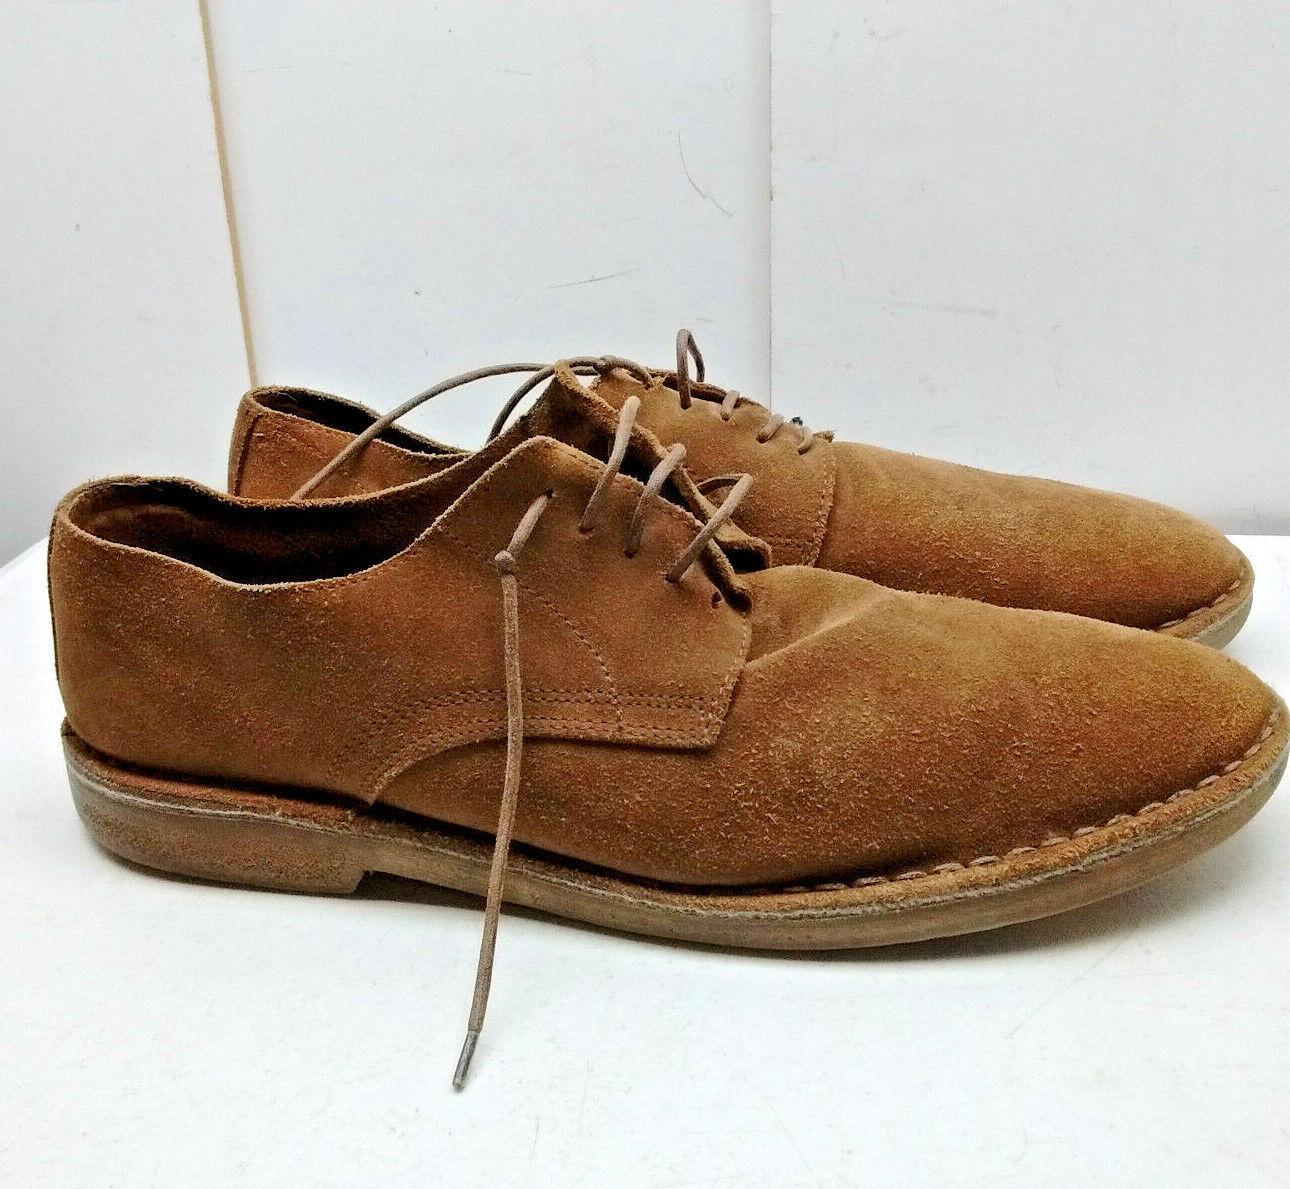 J.Crew  Brown Nubuk Leather Oxfords Plain Toe Casual Dress Men shoes 13.5M